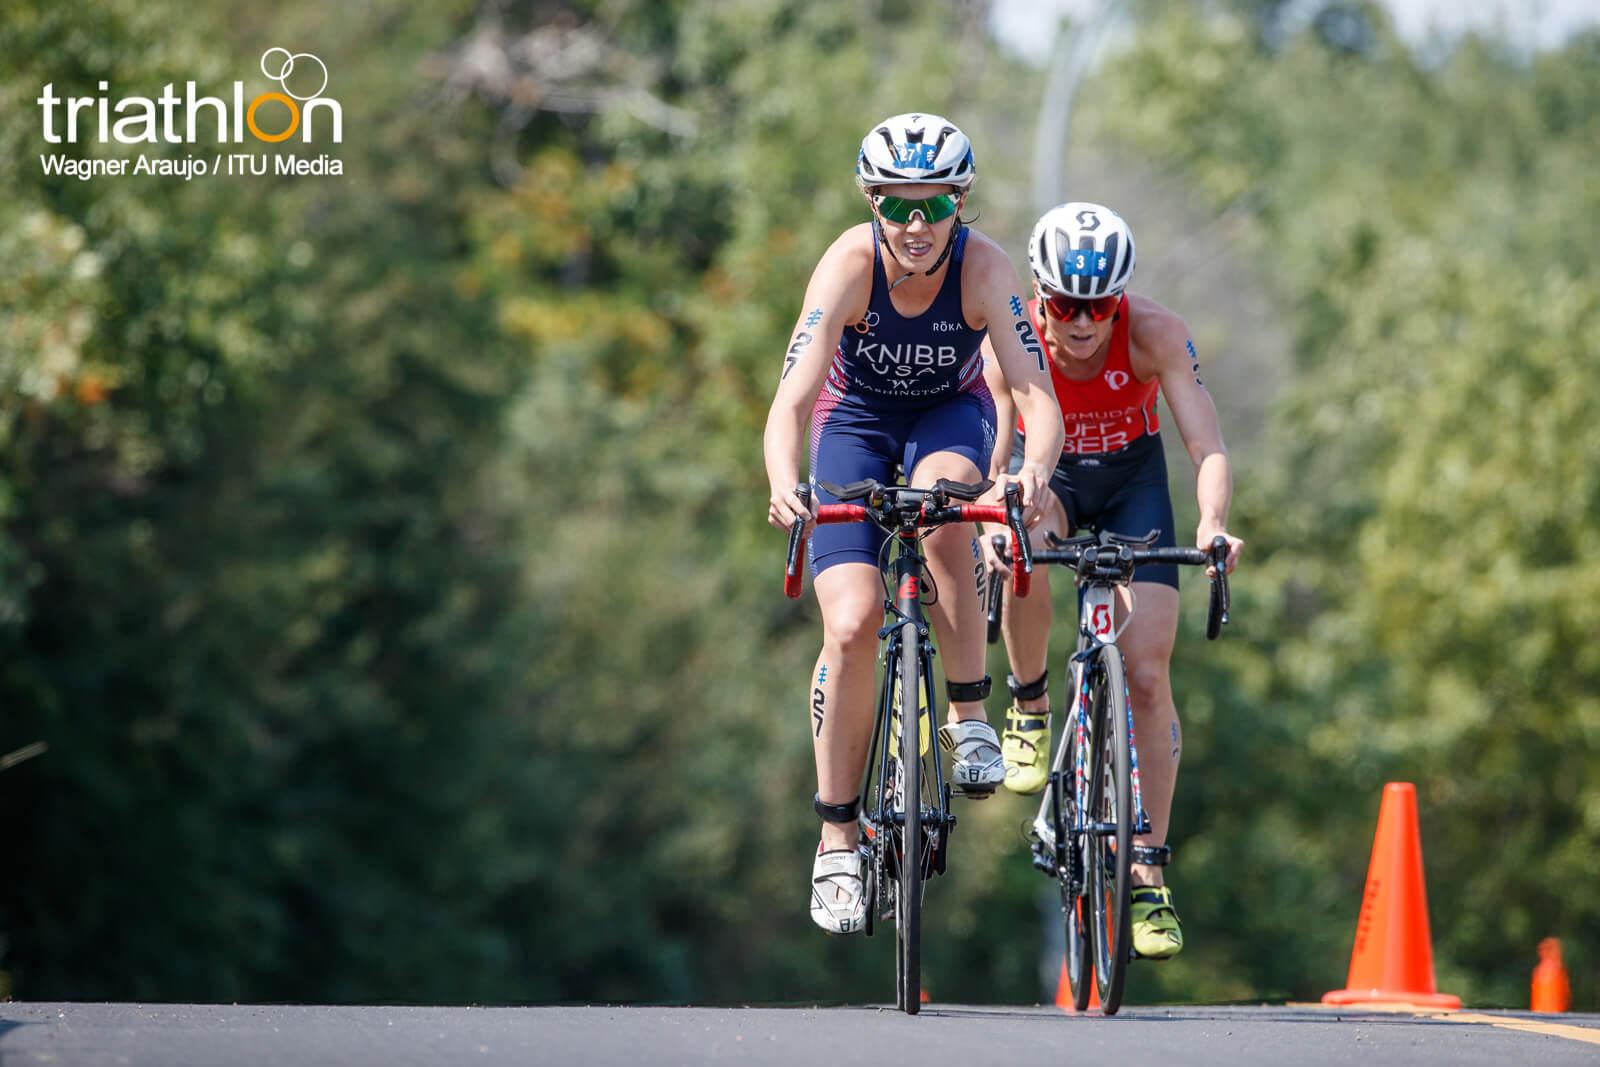 Taylor Knibb rides in Edmonton